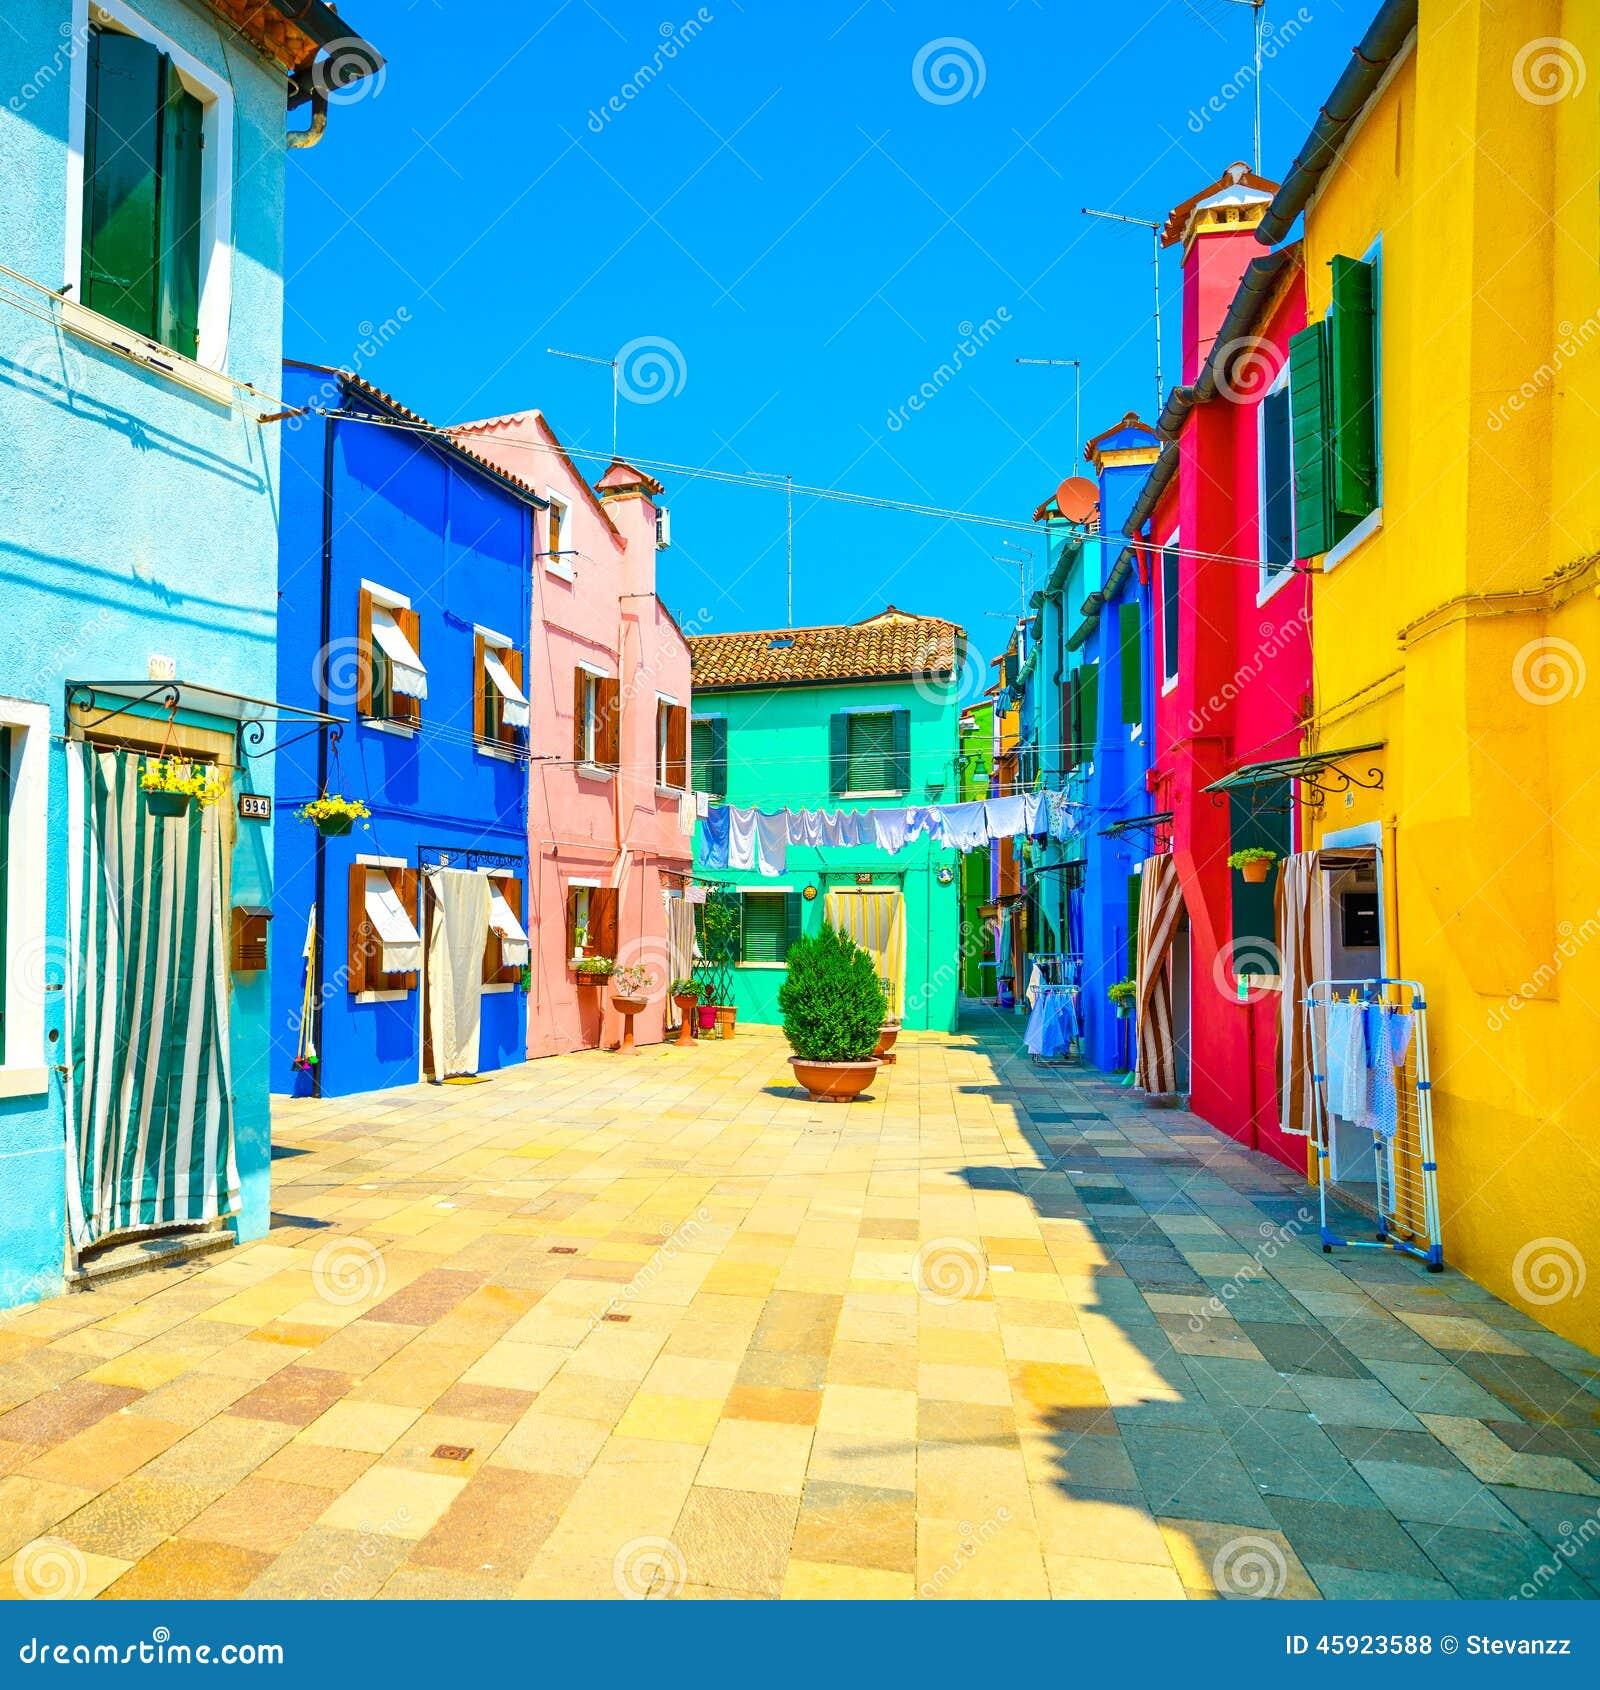 Venice Landmark, Burano Island Street, Colorful Houses, Italy Stock Photo - Image: 45923588